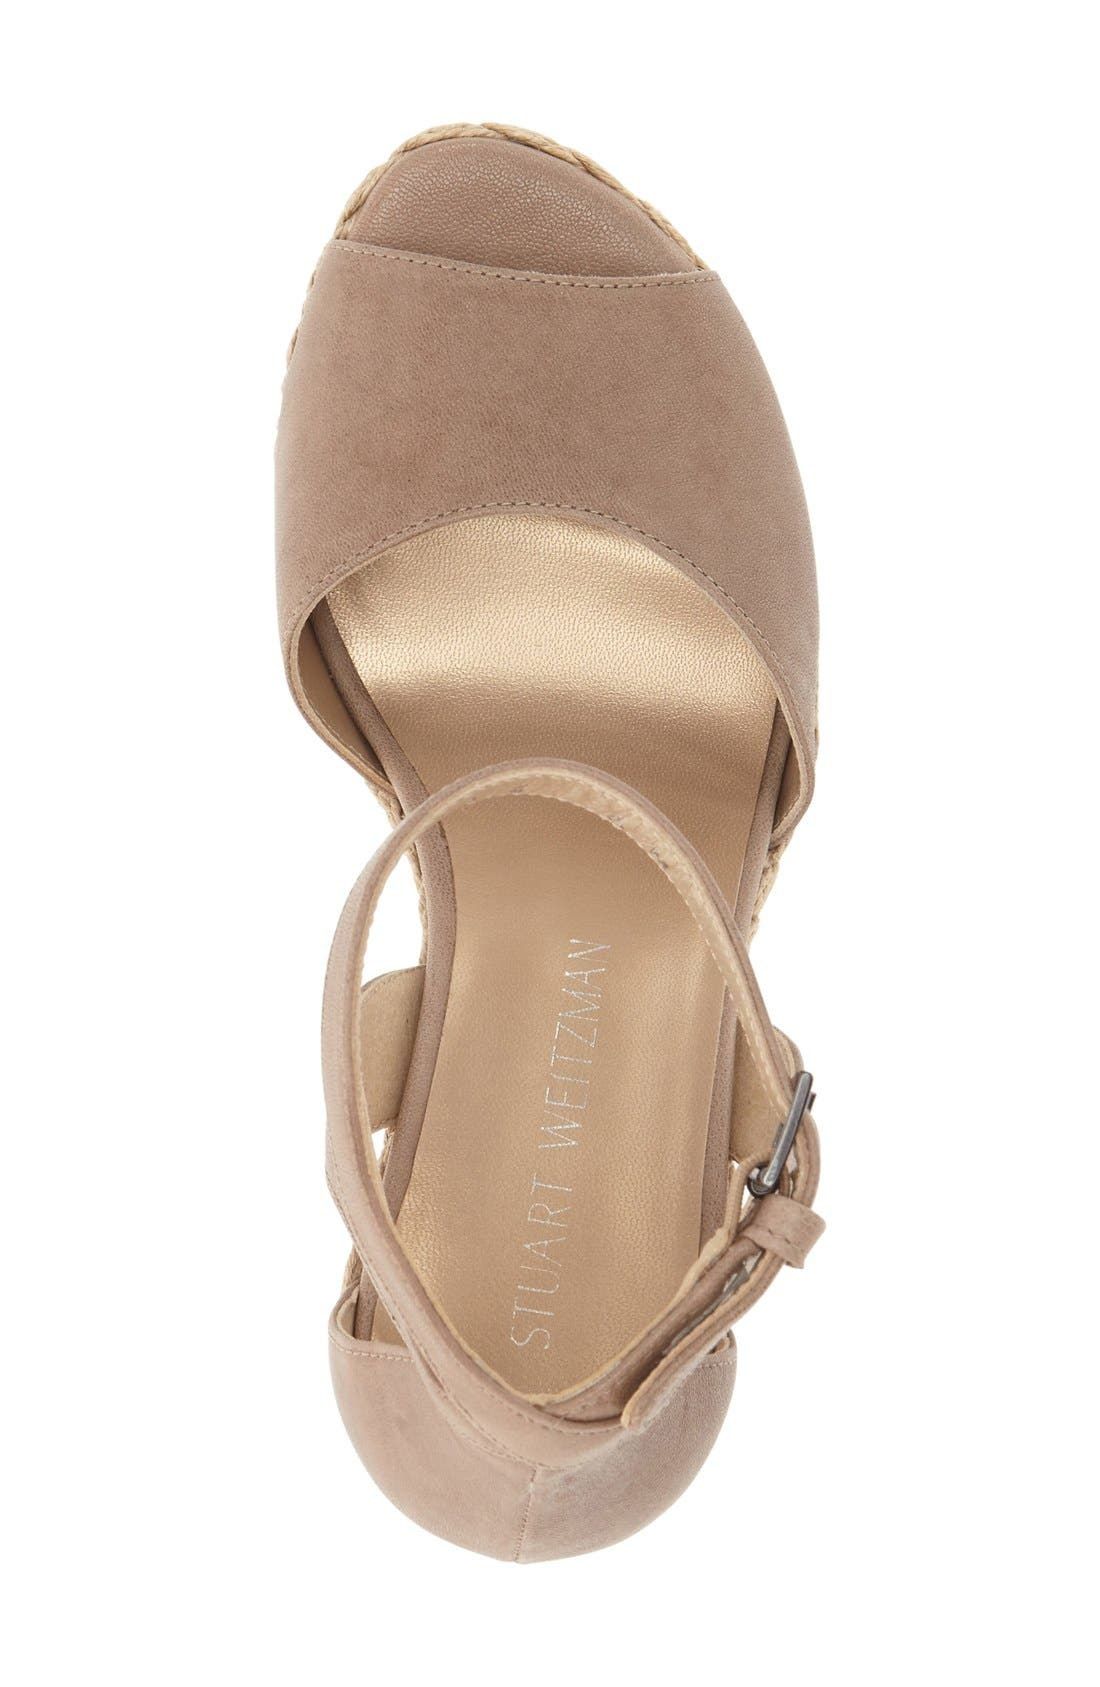 Alternate Image 3  - Stuart Weitzman 'Hijinx' Espadrille Platform Wedge Sandal (Women)